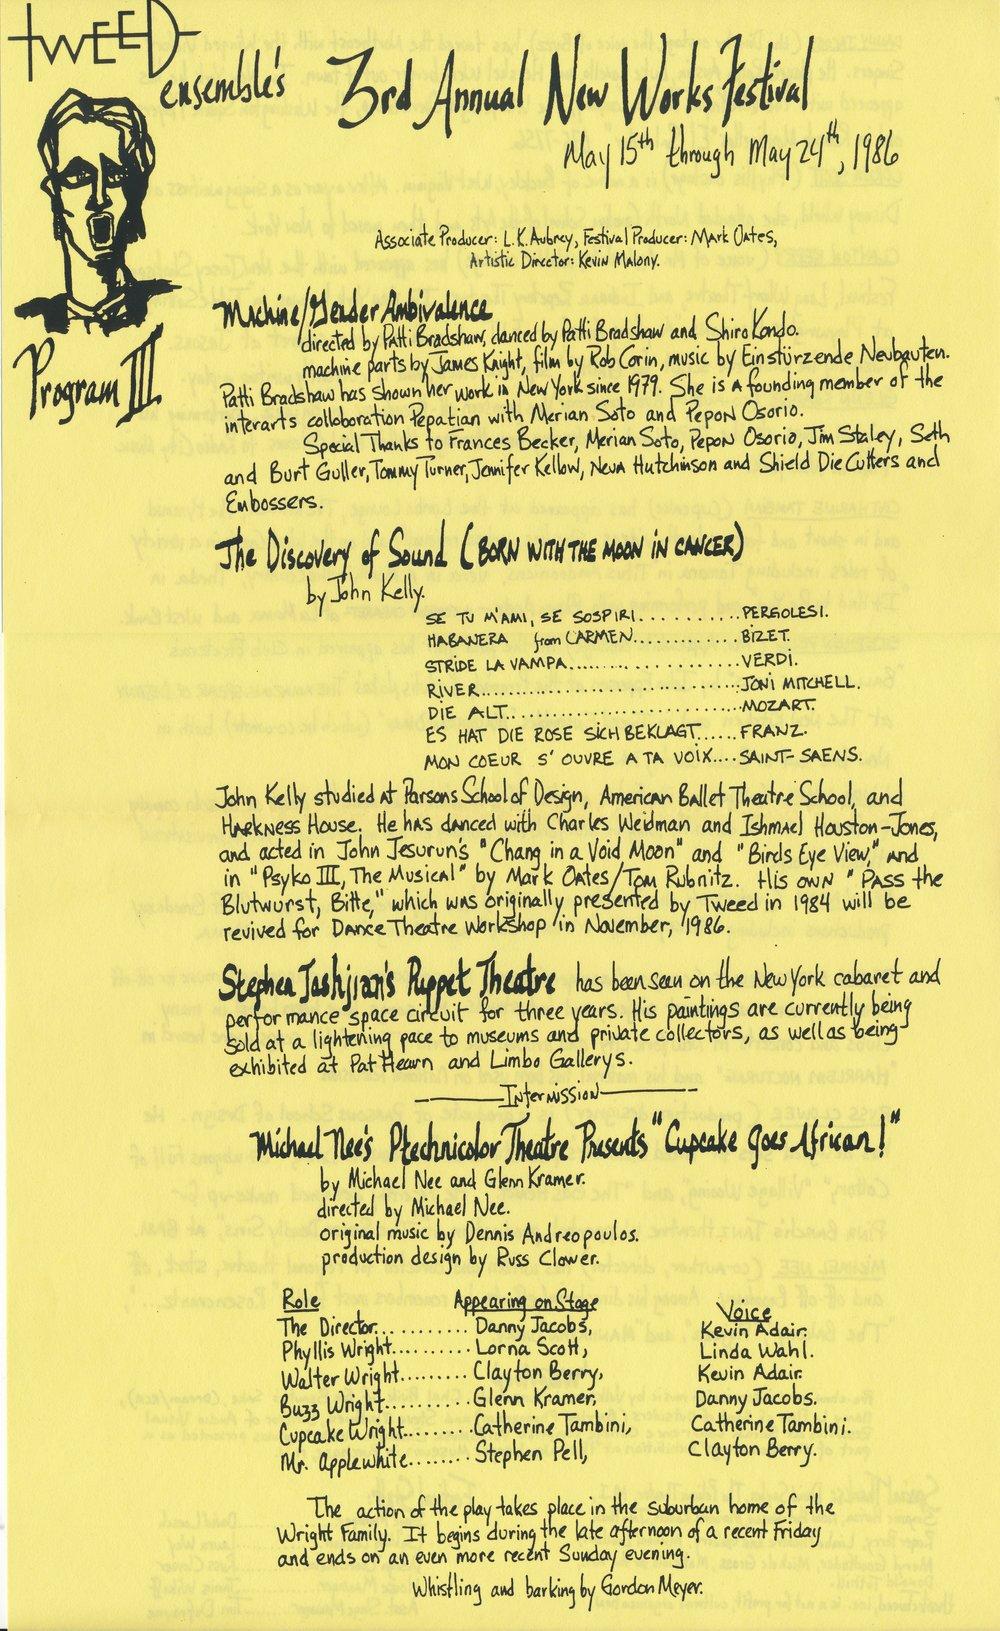 NEW WORKS FESTIVAL #3, 1986 - PELICAN STUDIOJohn Kelly, The Discovery of SoundIris Rose, WoolworthEric Darton, Salon Bob Bon presents Home TruthsKestutis Nakas, RasputinMichael Nee, Ptechnicolor TheaterSusan Schneider, Excerpts from the New Efficiency ManualMark Phredd, Hapi PhaceEdgar Oliver, The Poetry KillerStephen Tashjian, Puppet TheaterPaul Proveaux, RENOPatti Bradshaw, Machine/Gender Ambivalence